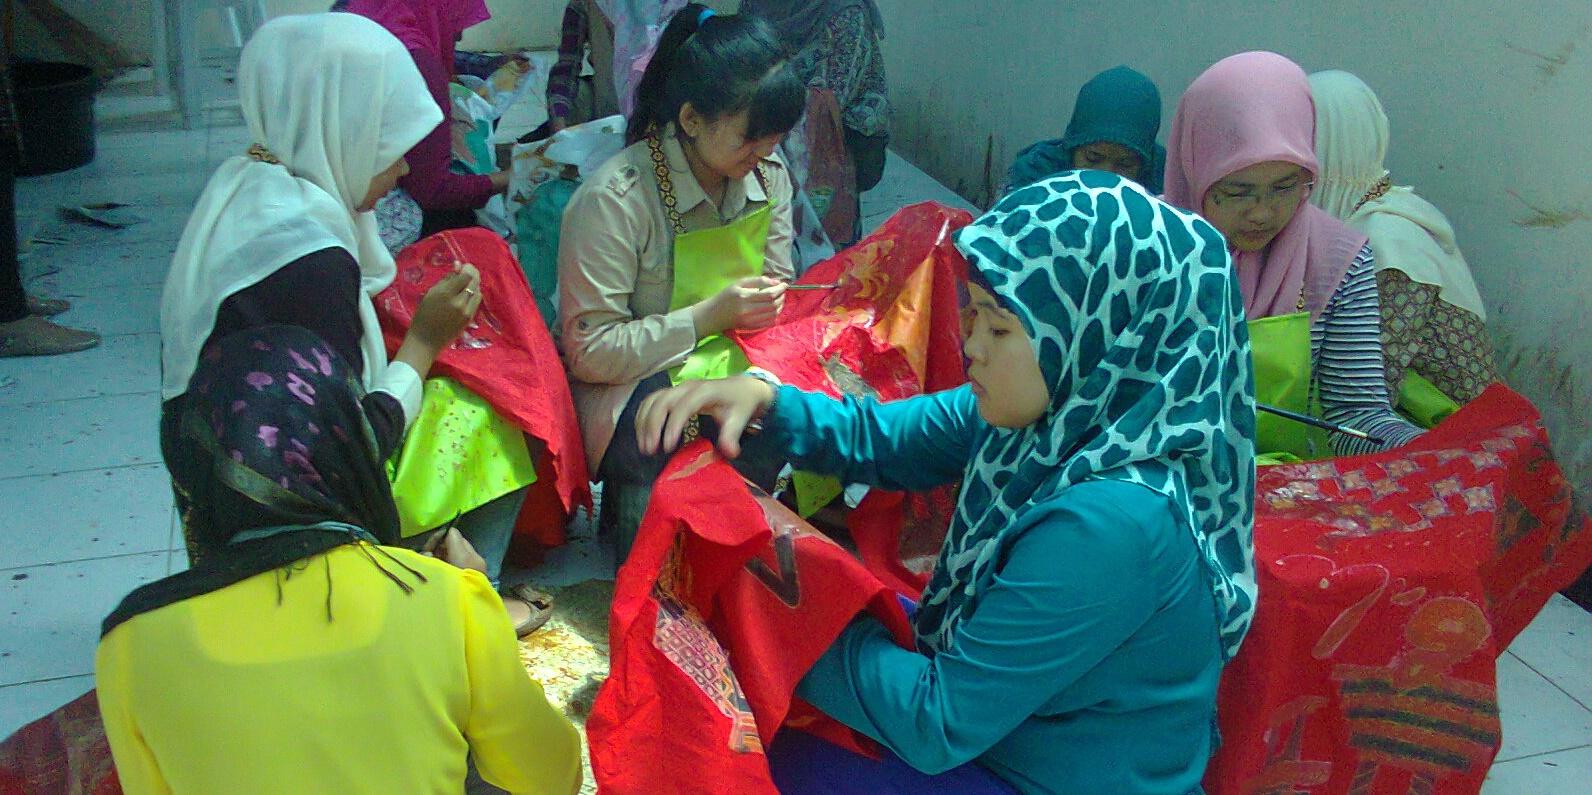 Fakultas Teknik Gelar Pameran Tekstil